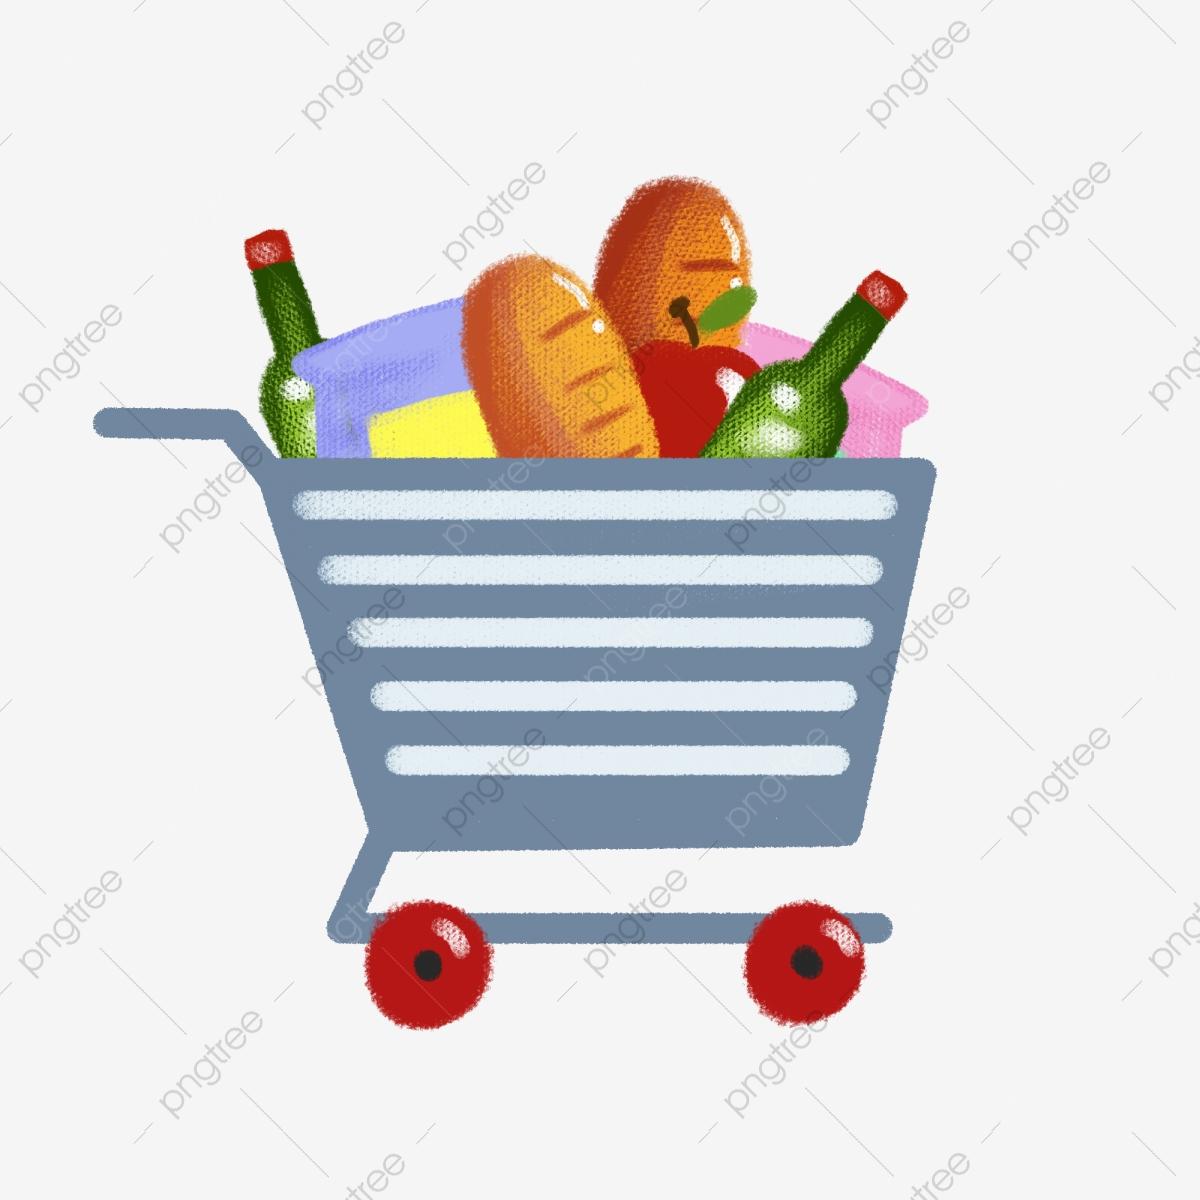 Cartoon supermarket to cart. Buy clipart food shopping